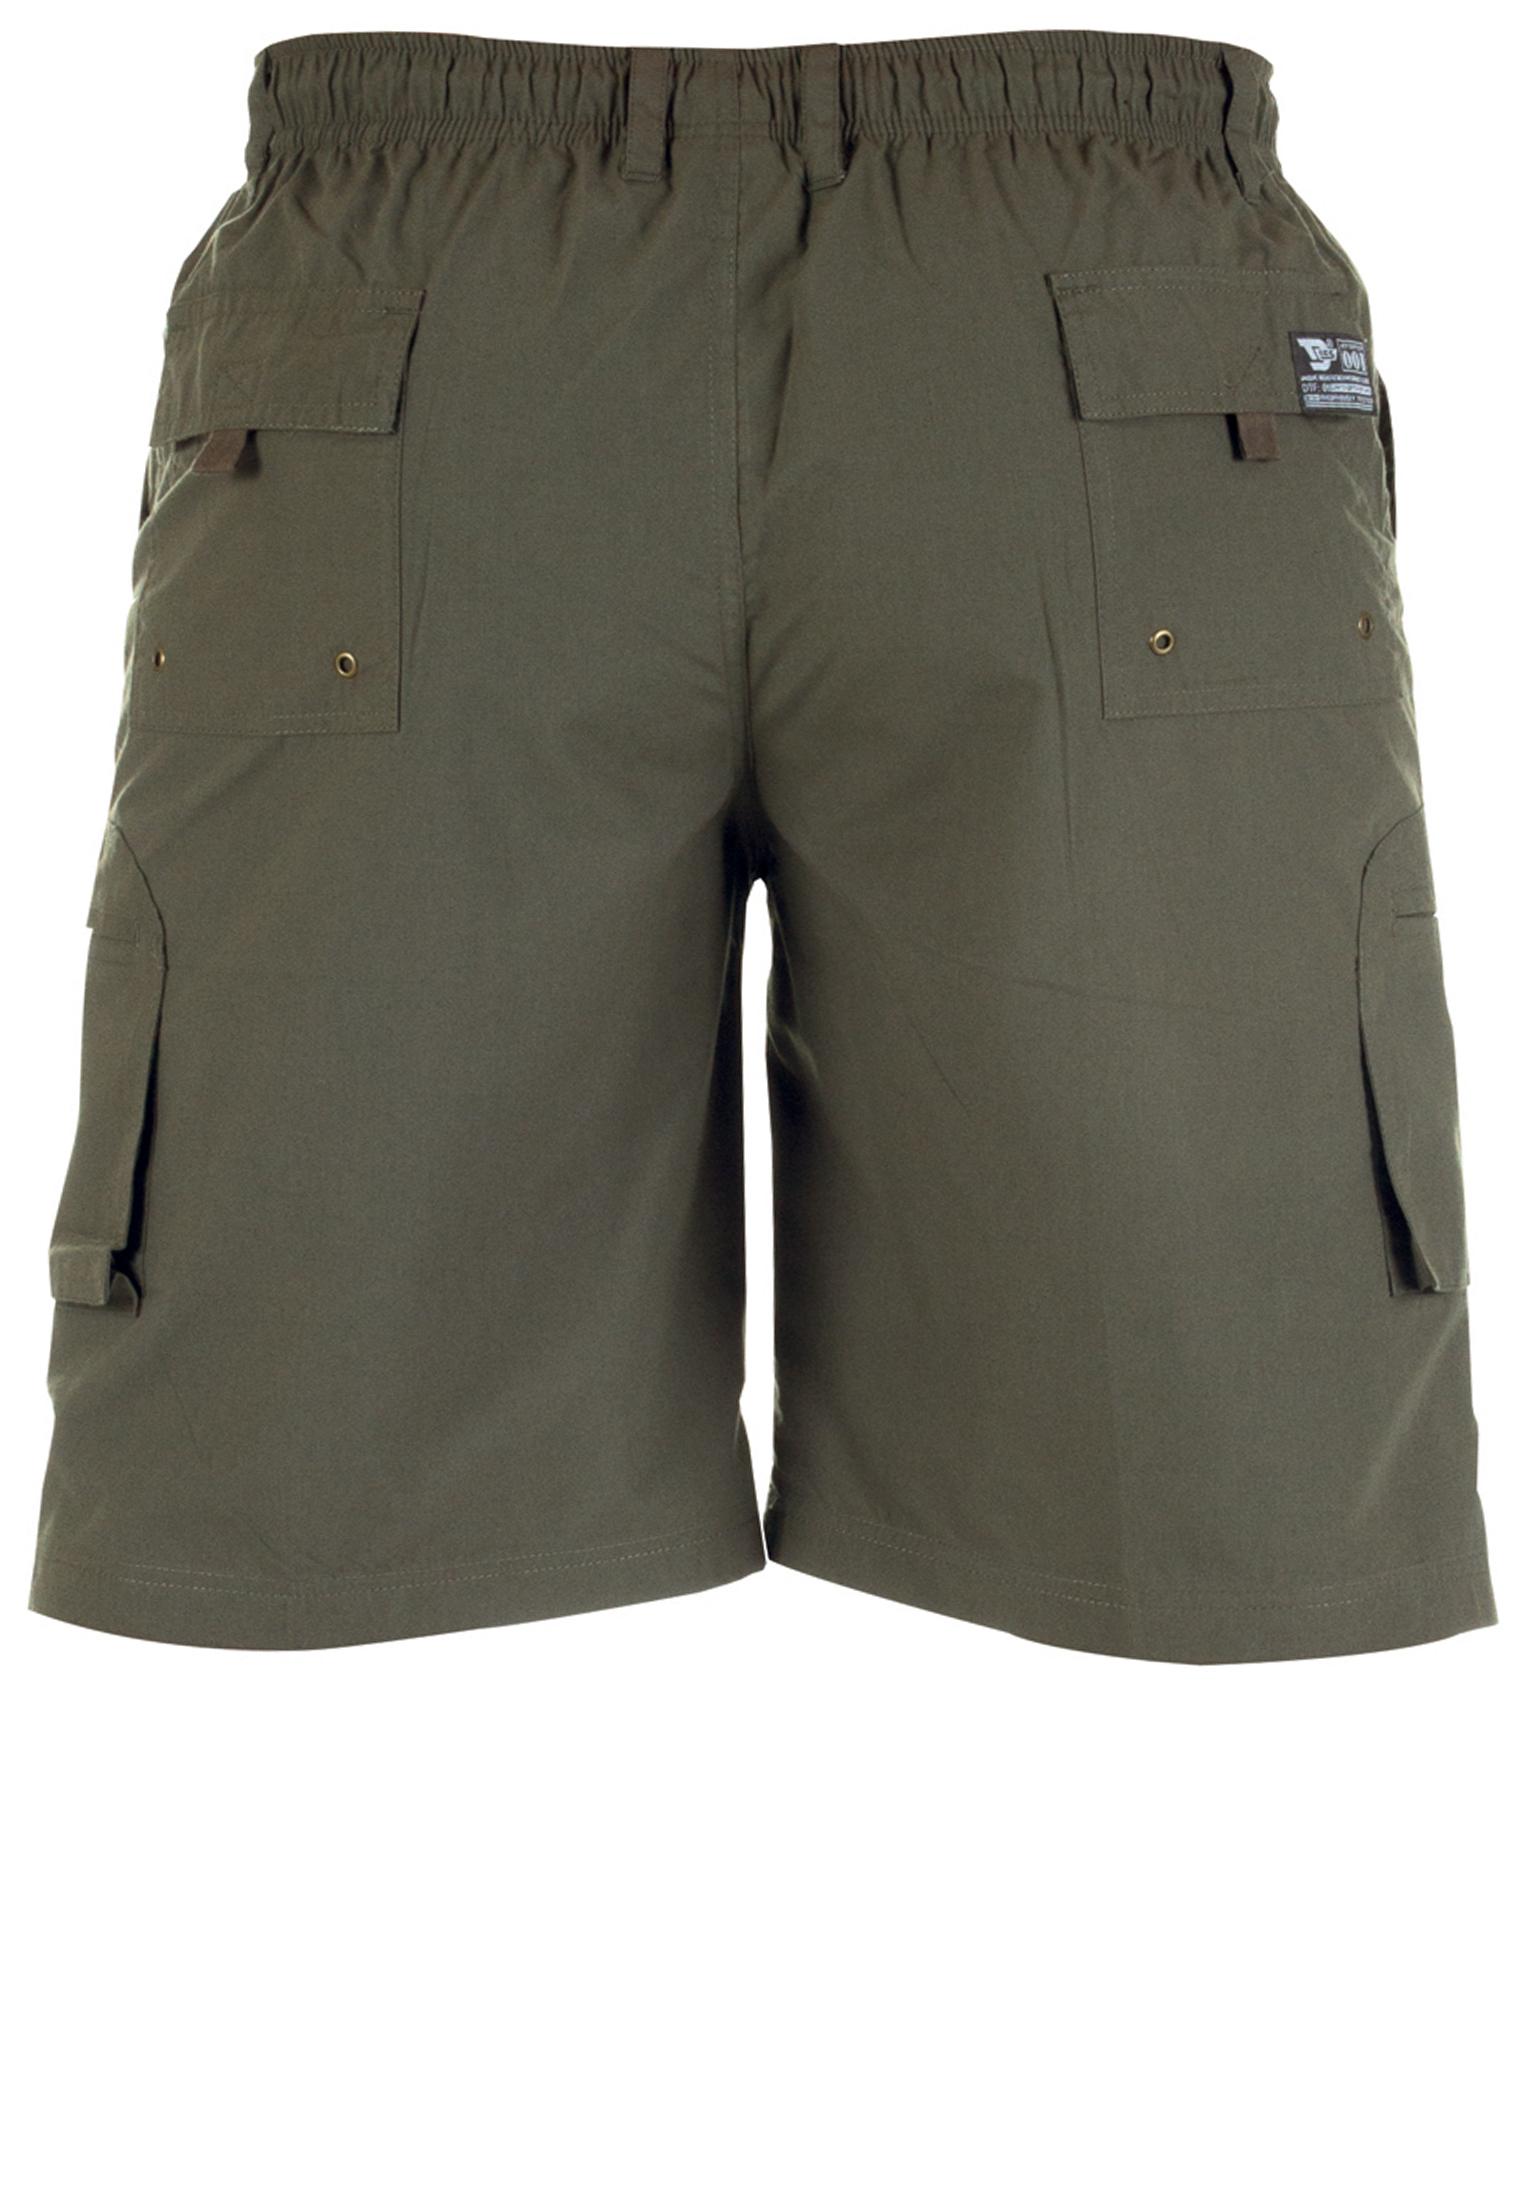 D555 Cargo shorts elastische band - KS20462-600 - Melvinsi